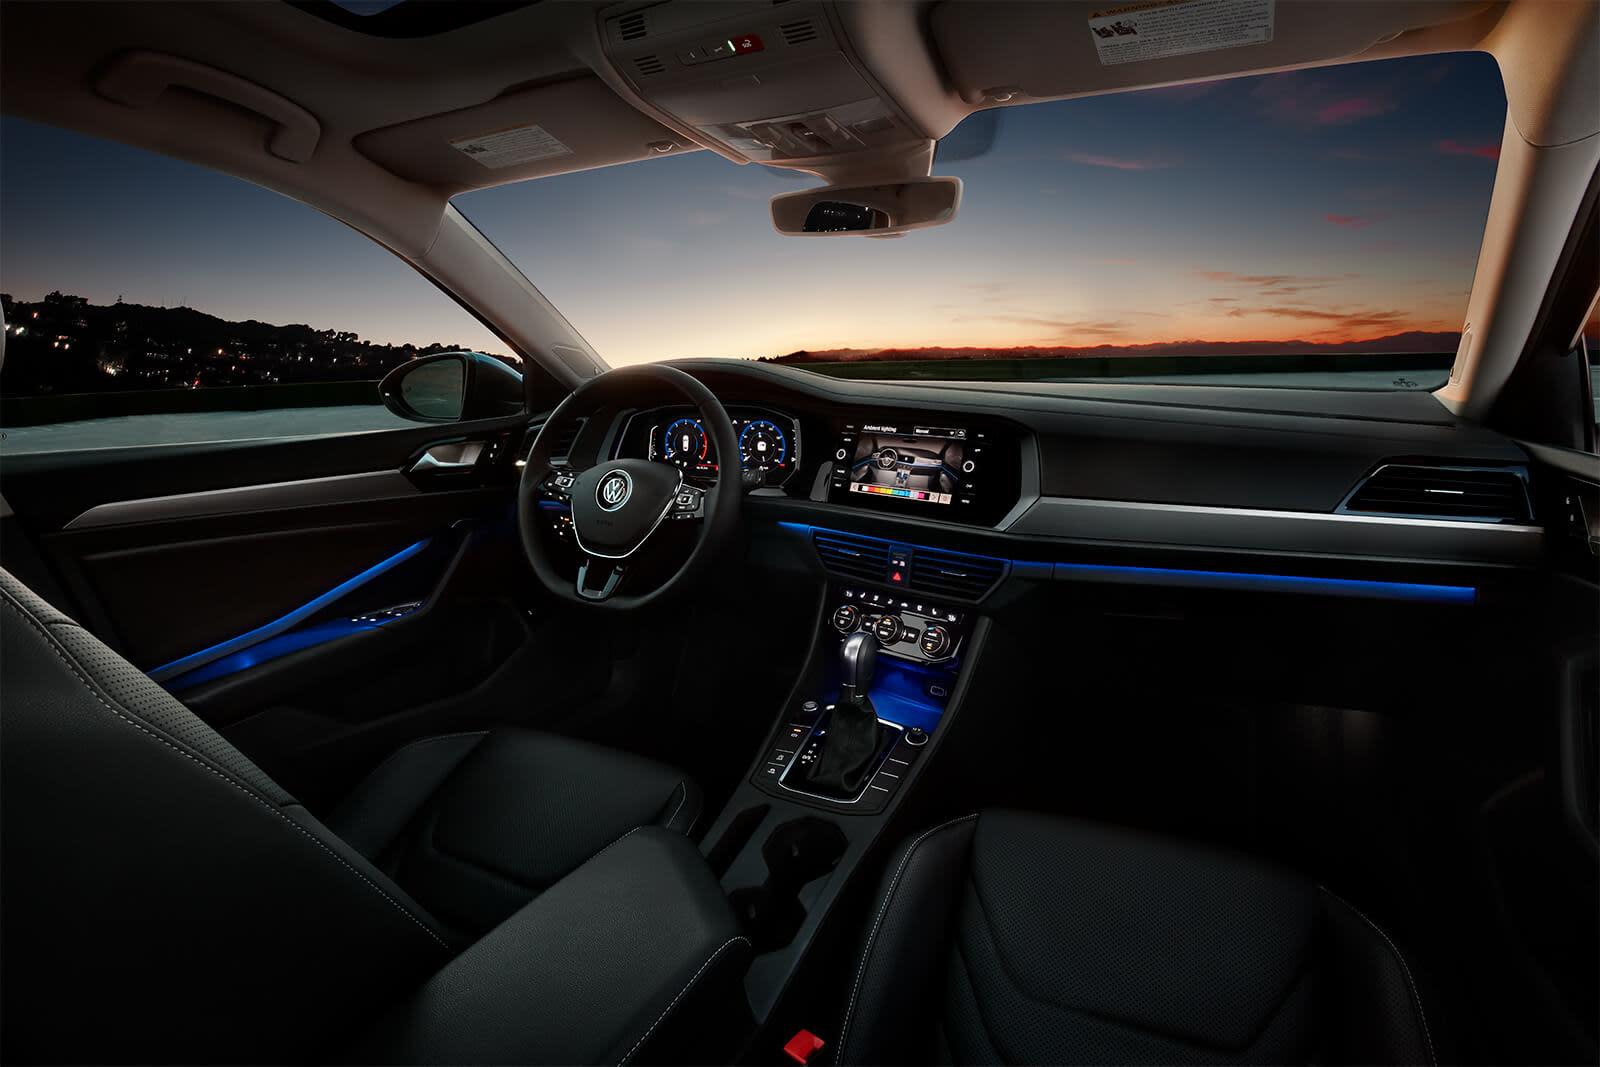 2019 Jetta Cockpit